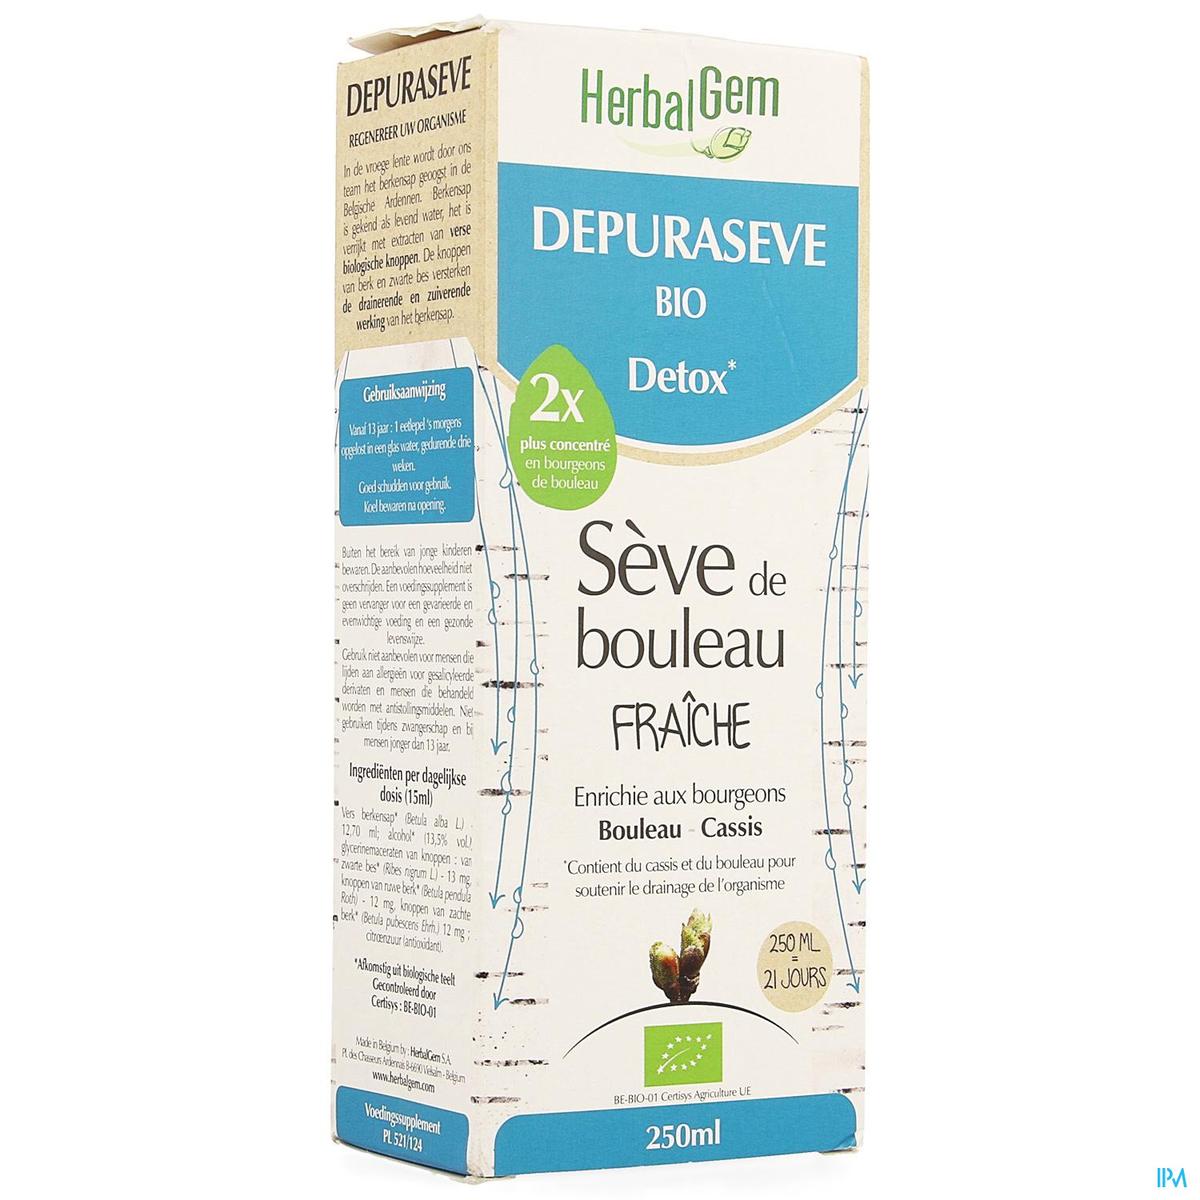 Herbalgem Depuraseve Bio Detox 250ml